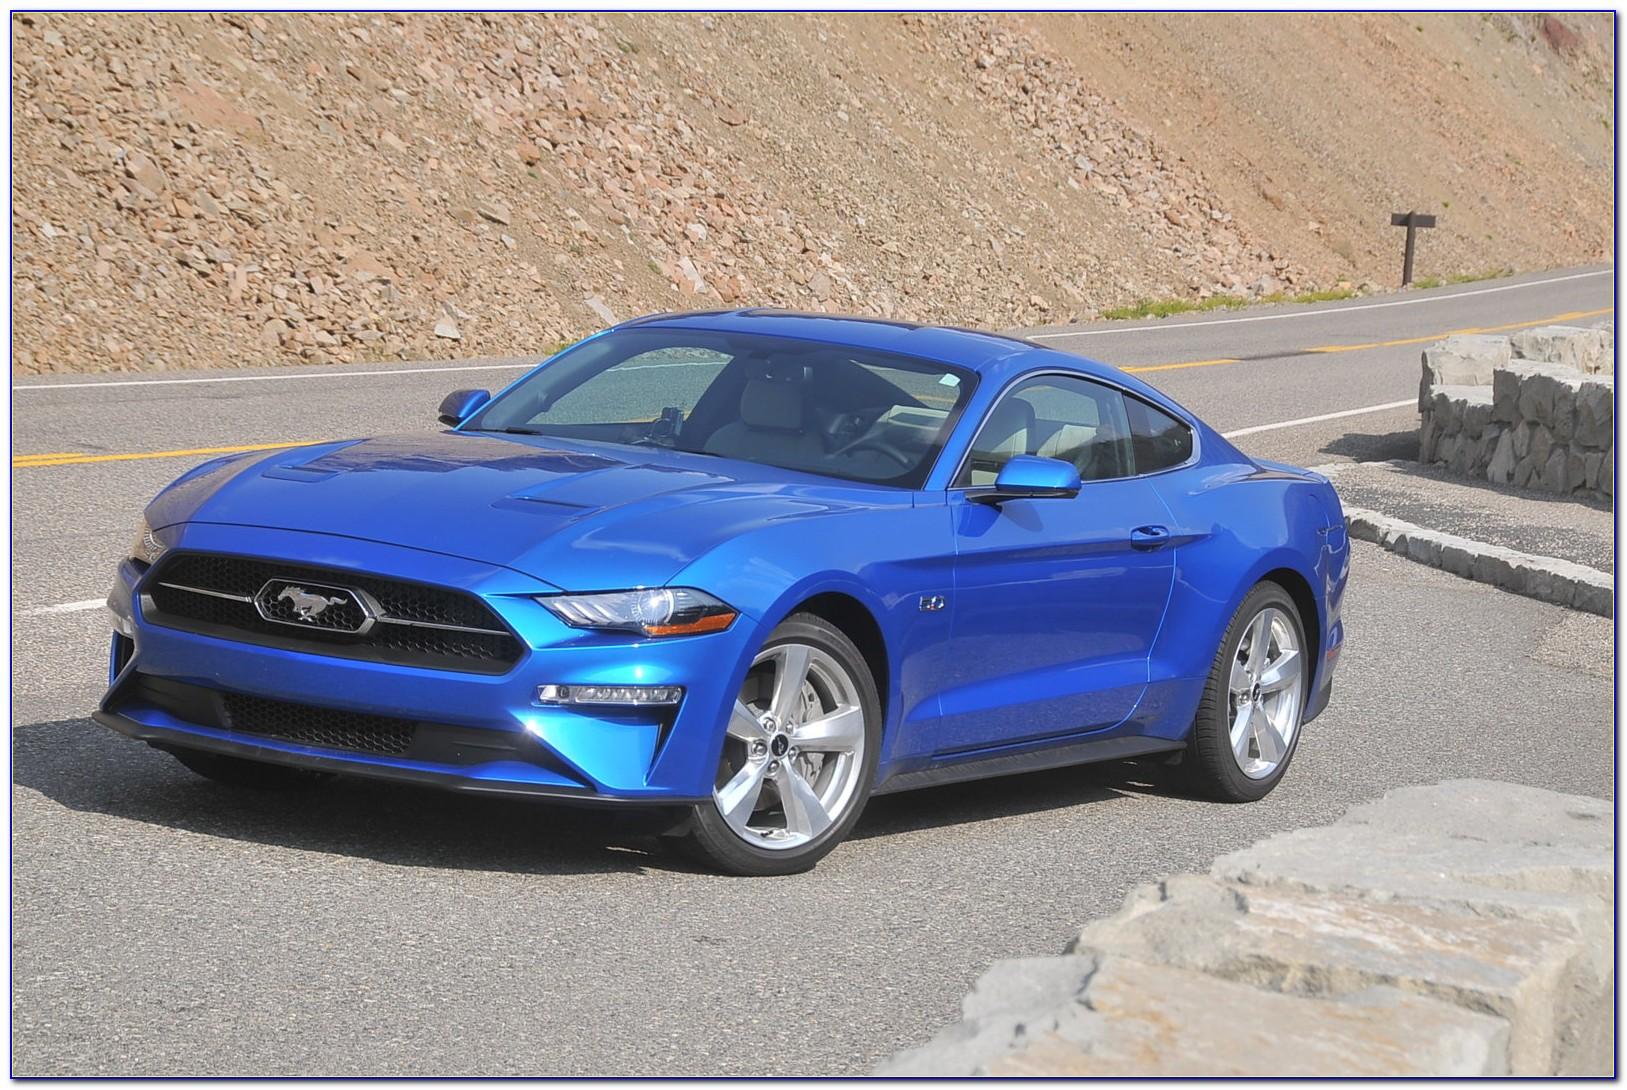 2019 Ford Mustang Bullitt Brochure Pdf